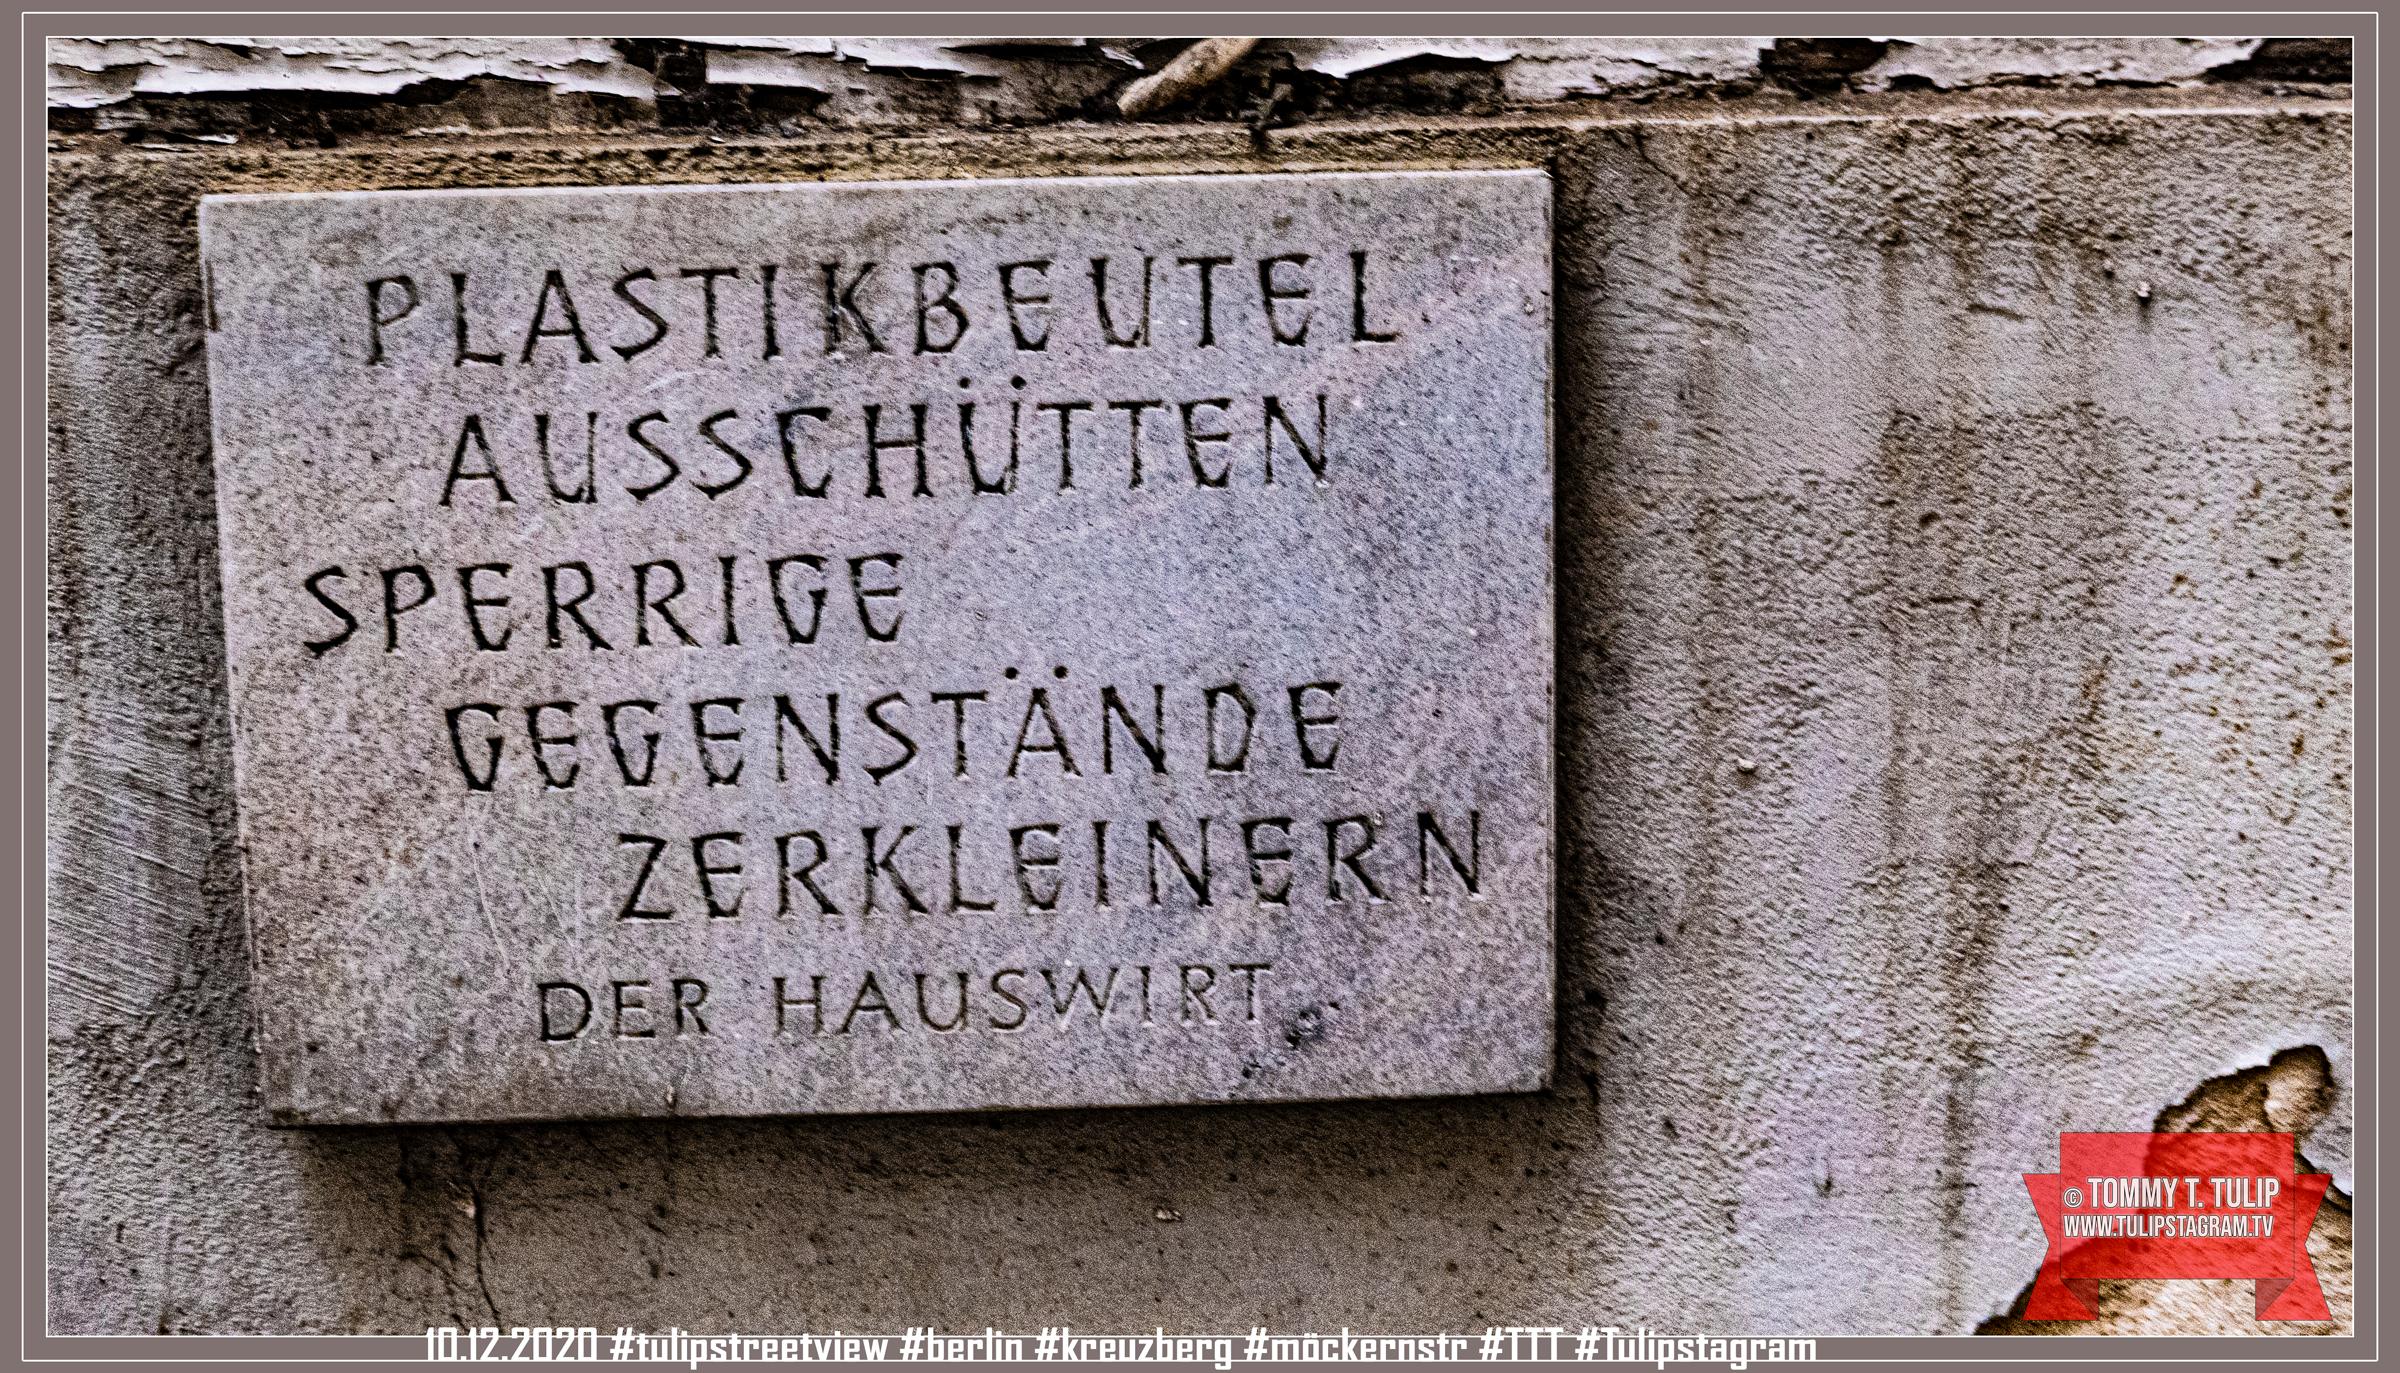 10.12.2020 #tulipstreetview #berlin #kreuzberg #möckernstr #TTT #Tulipstagram